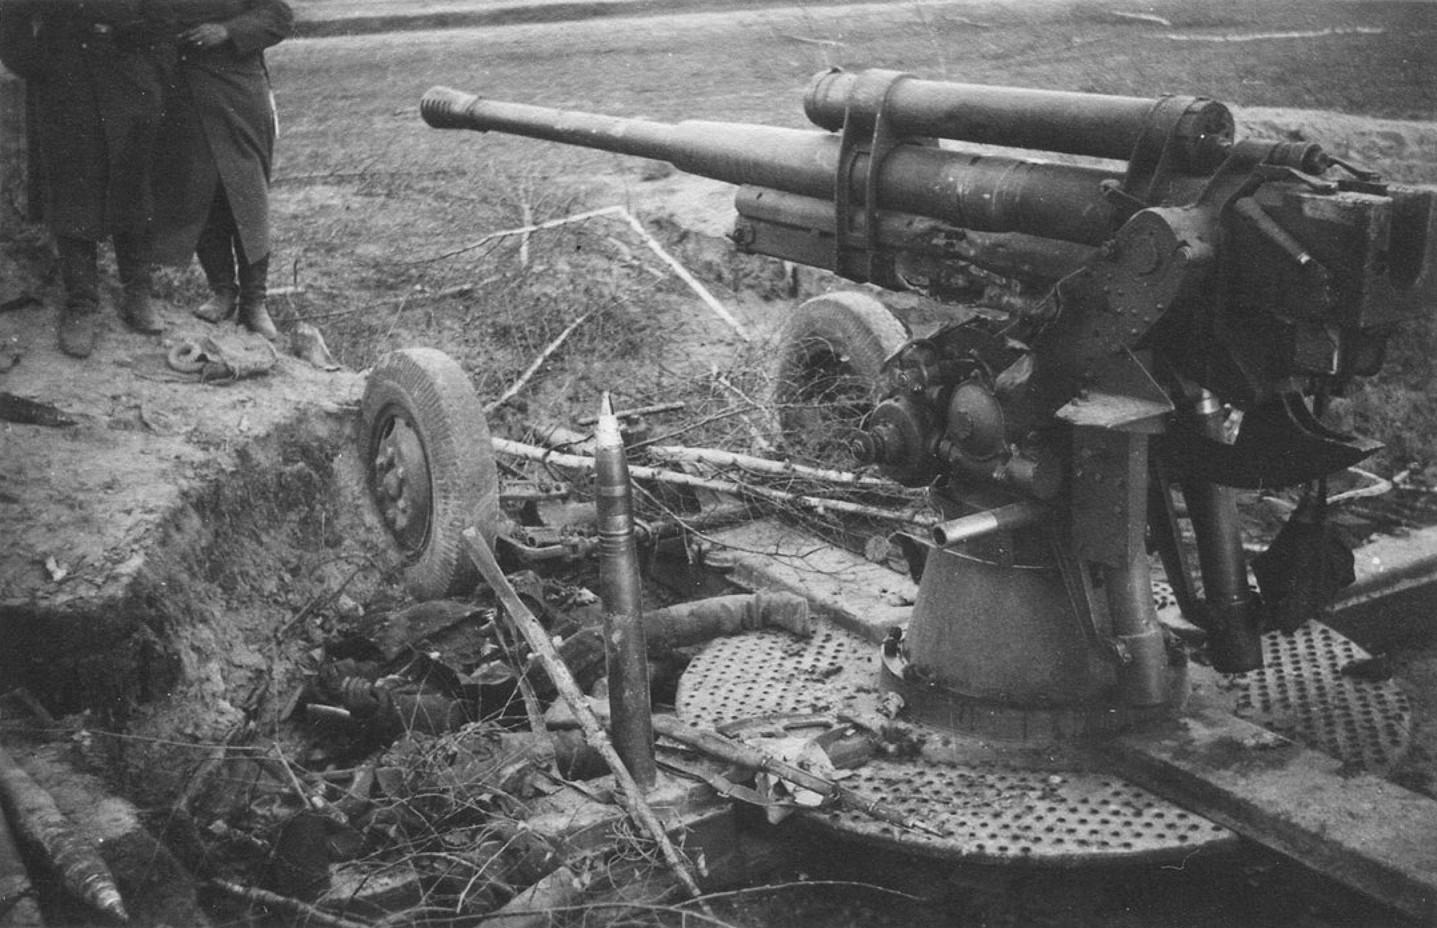 85-мм зенитная пушка на прямой наводке РККА